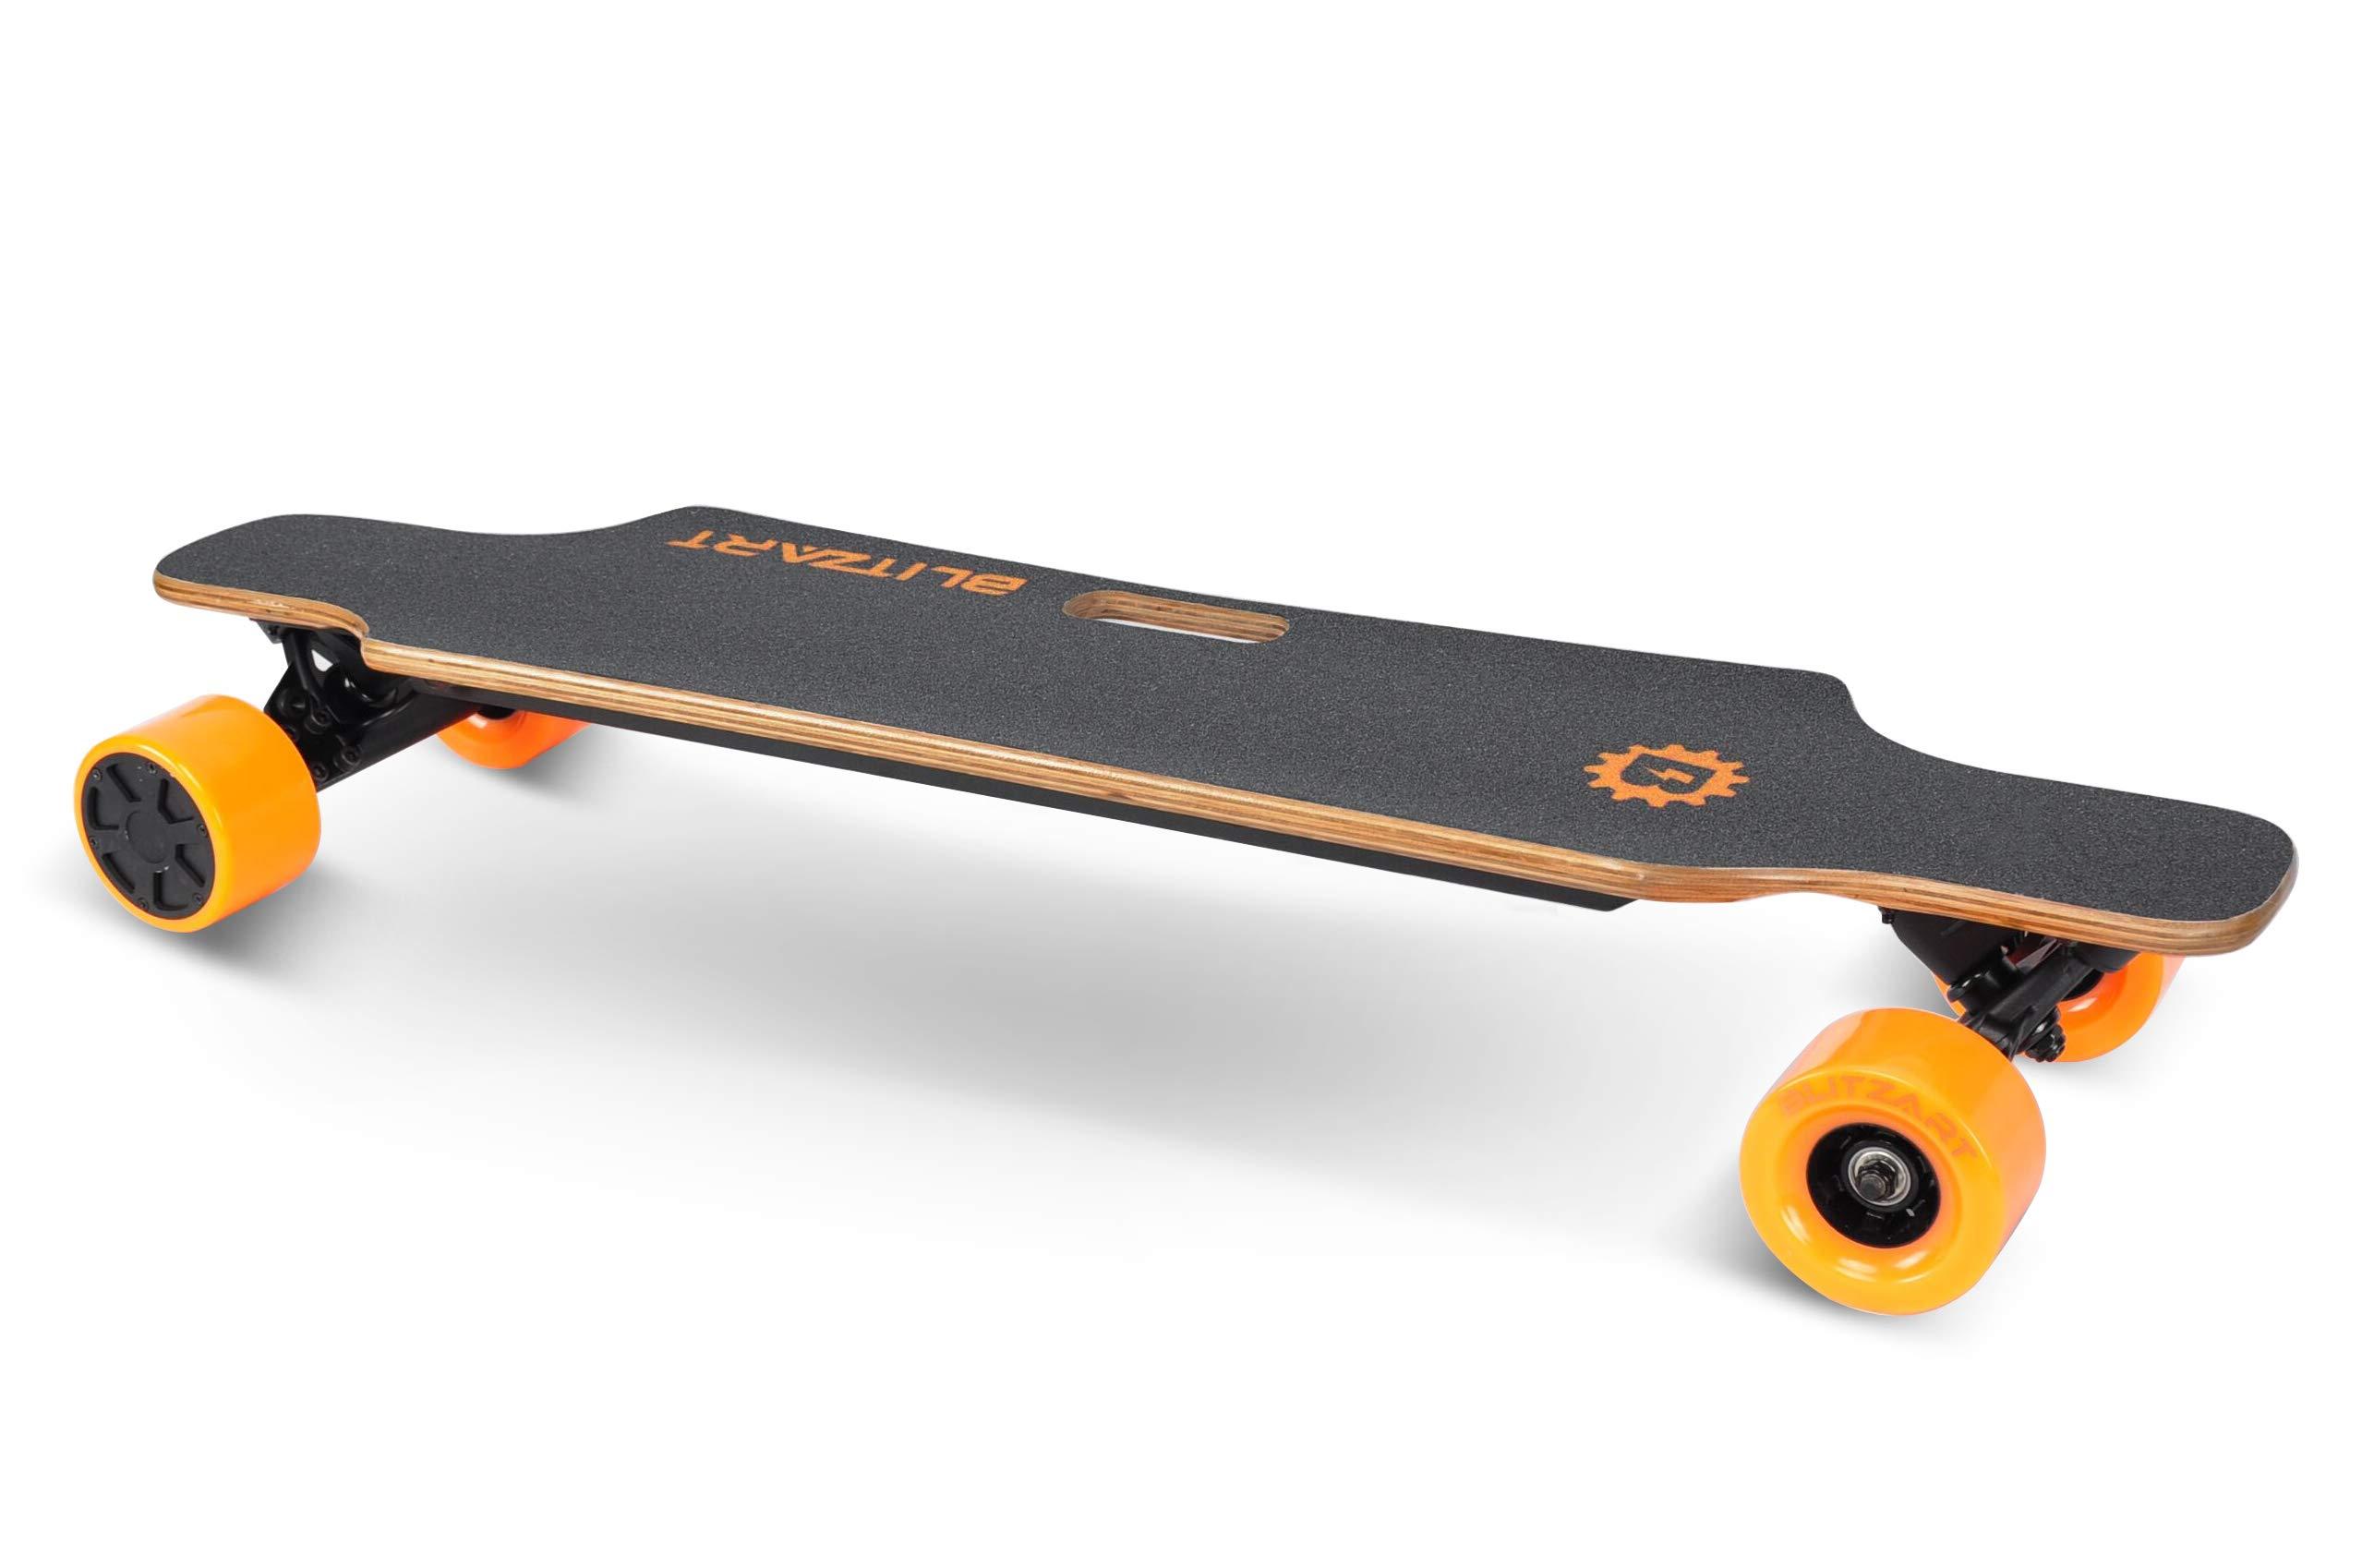 BLITZART Huracane 38'' Electric Skateobard Longboard E-Skateboard Motorized Electronic Hub-Motor 3.5'' Wheels